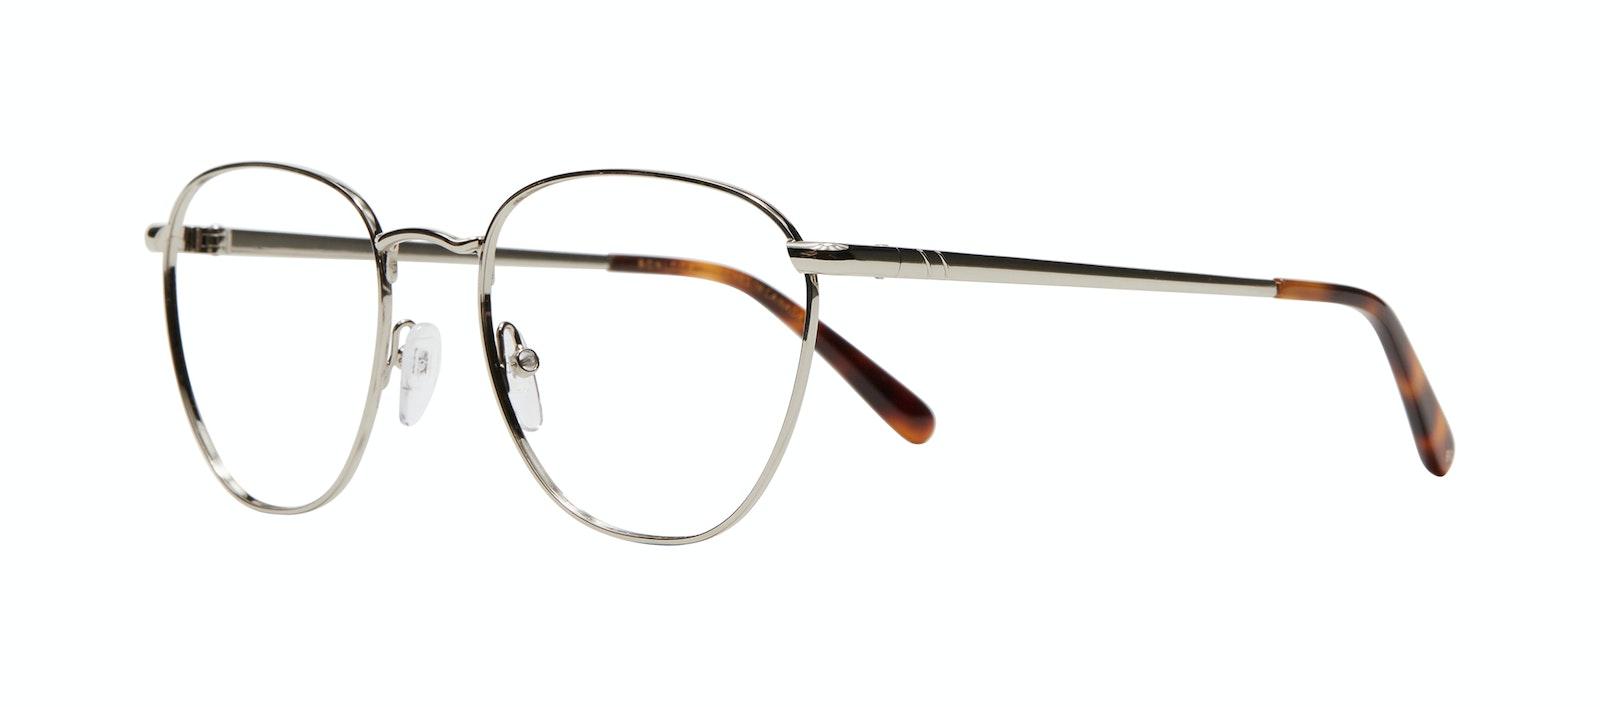 Affordable Fashion Glasses Round Eyeglasses Women Radiant Silver Tilt